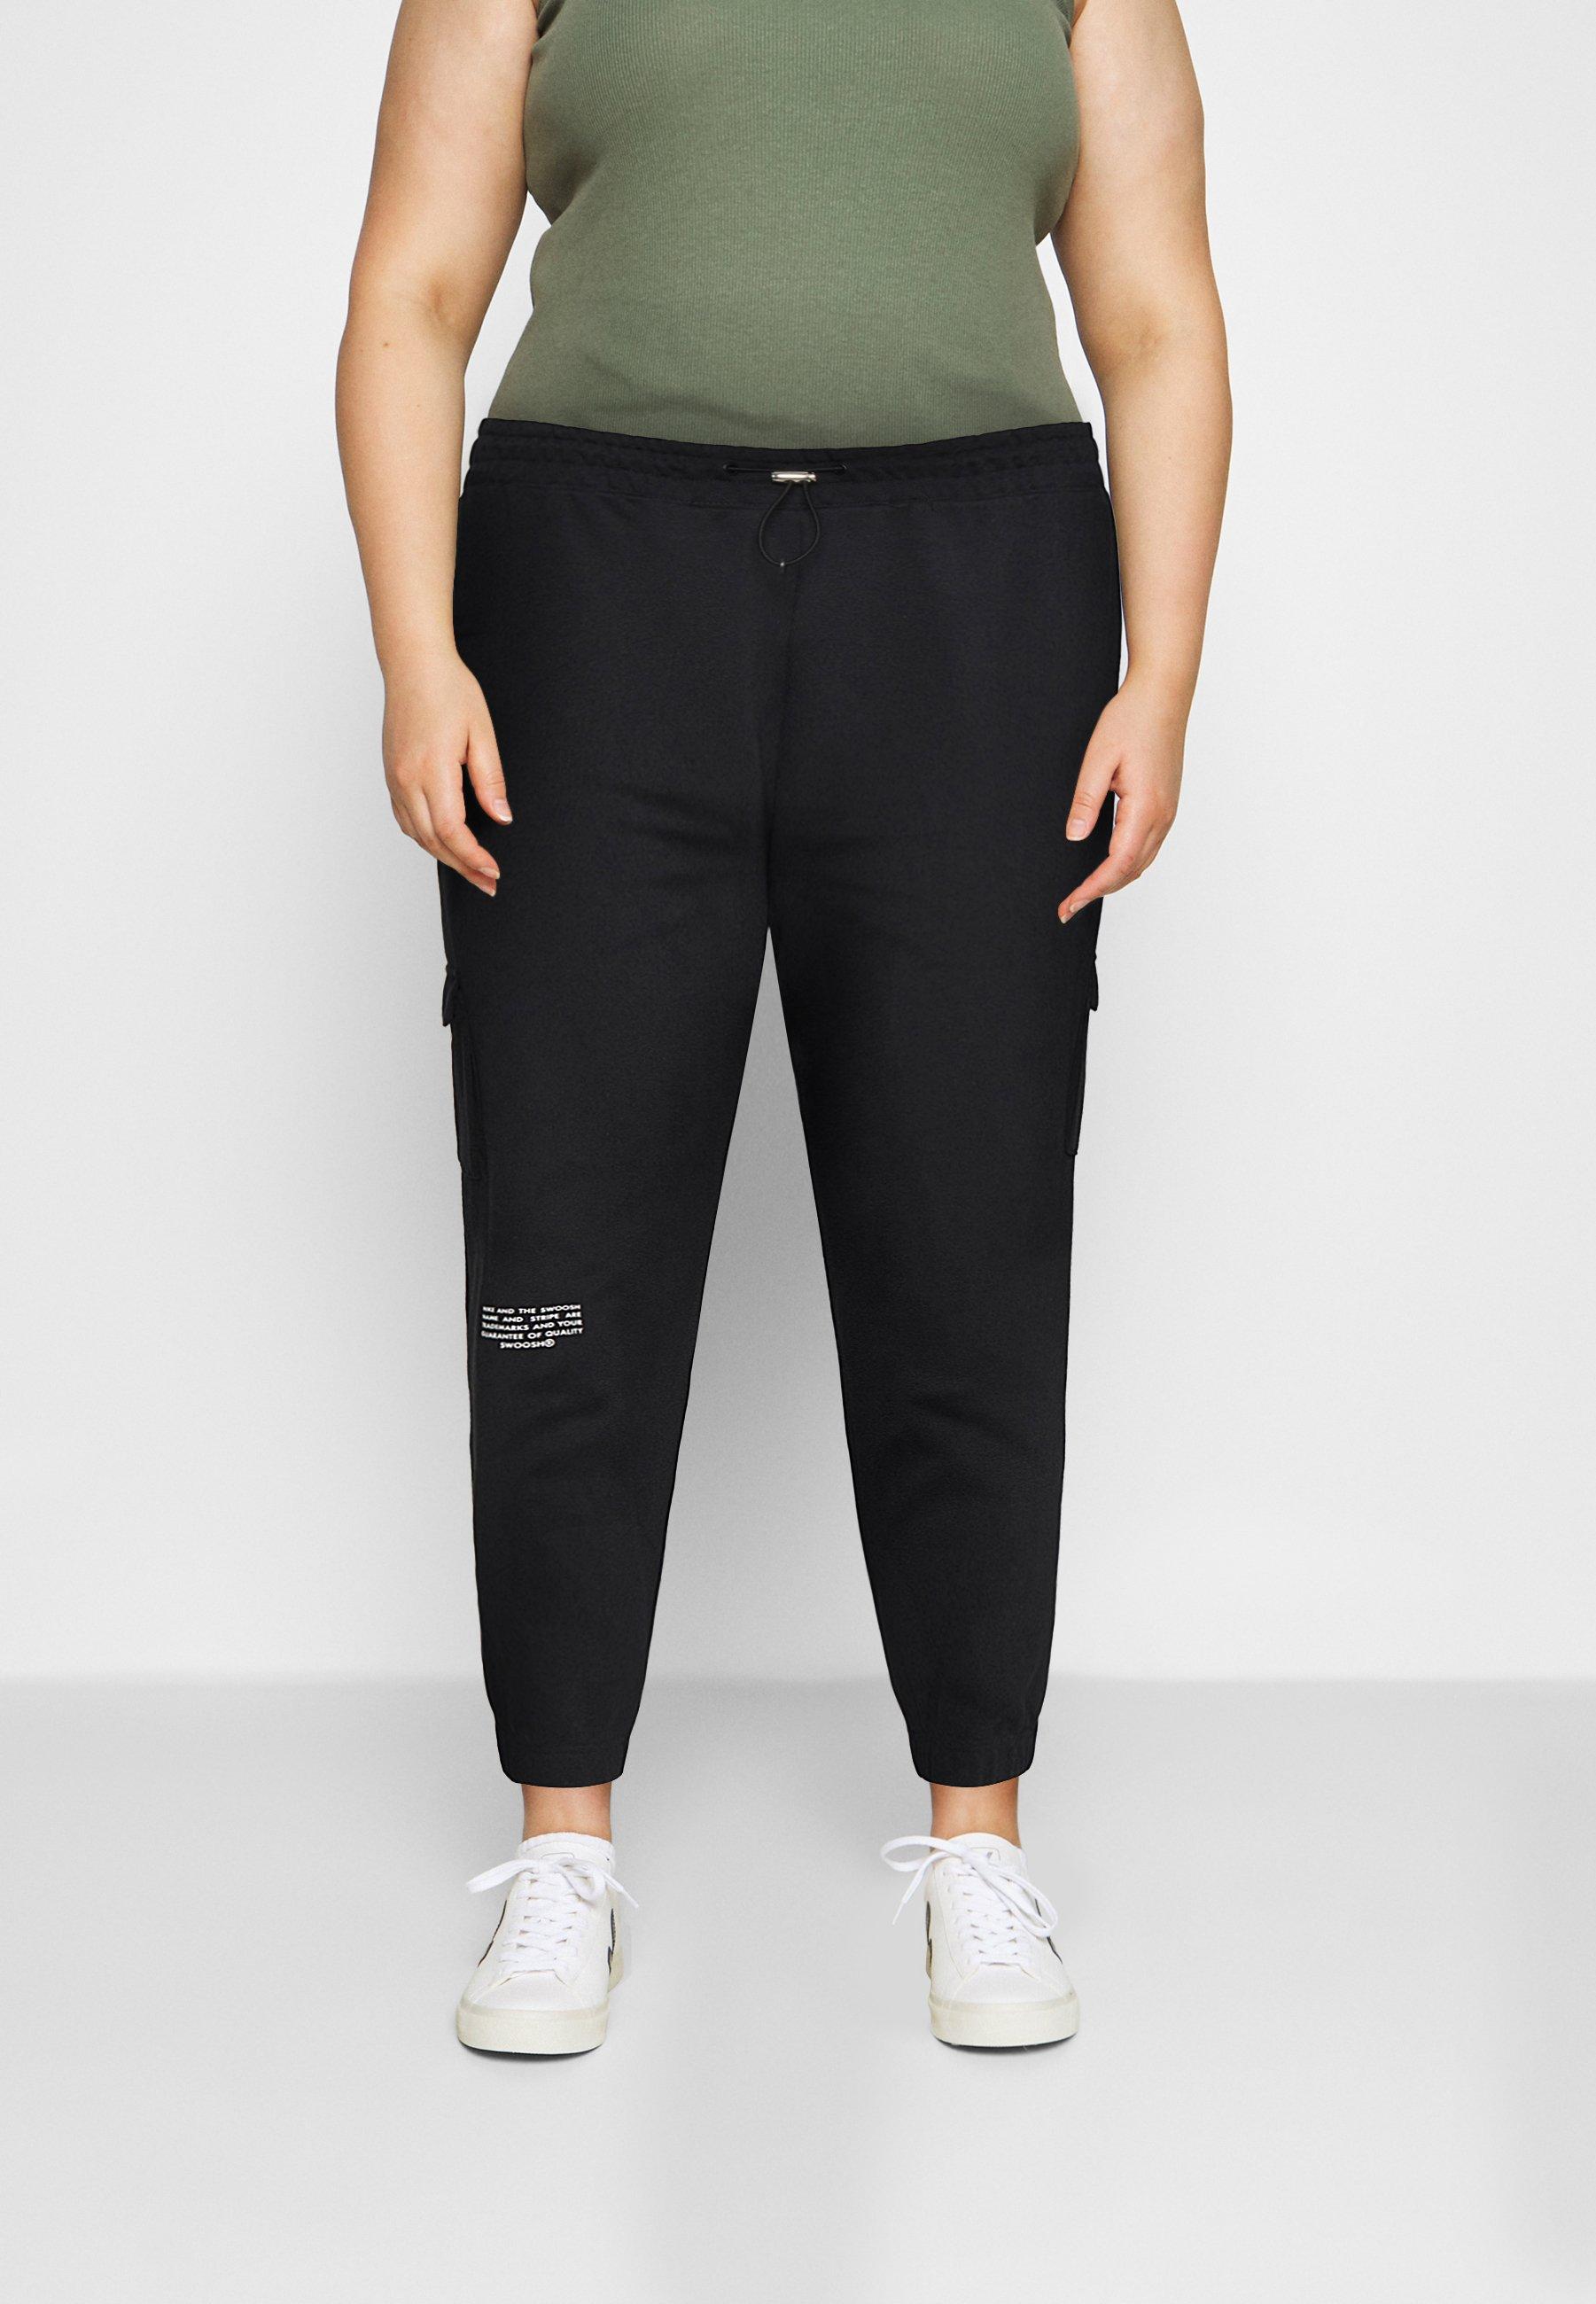 Femme PANT - Pantalon cargo